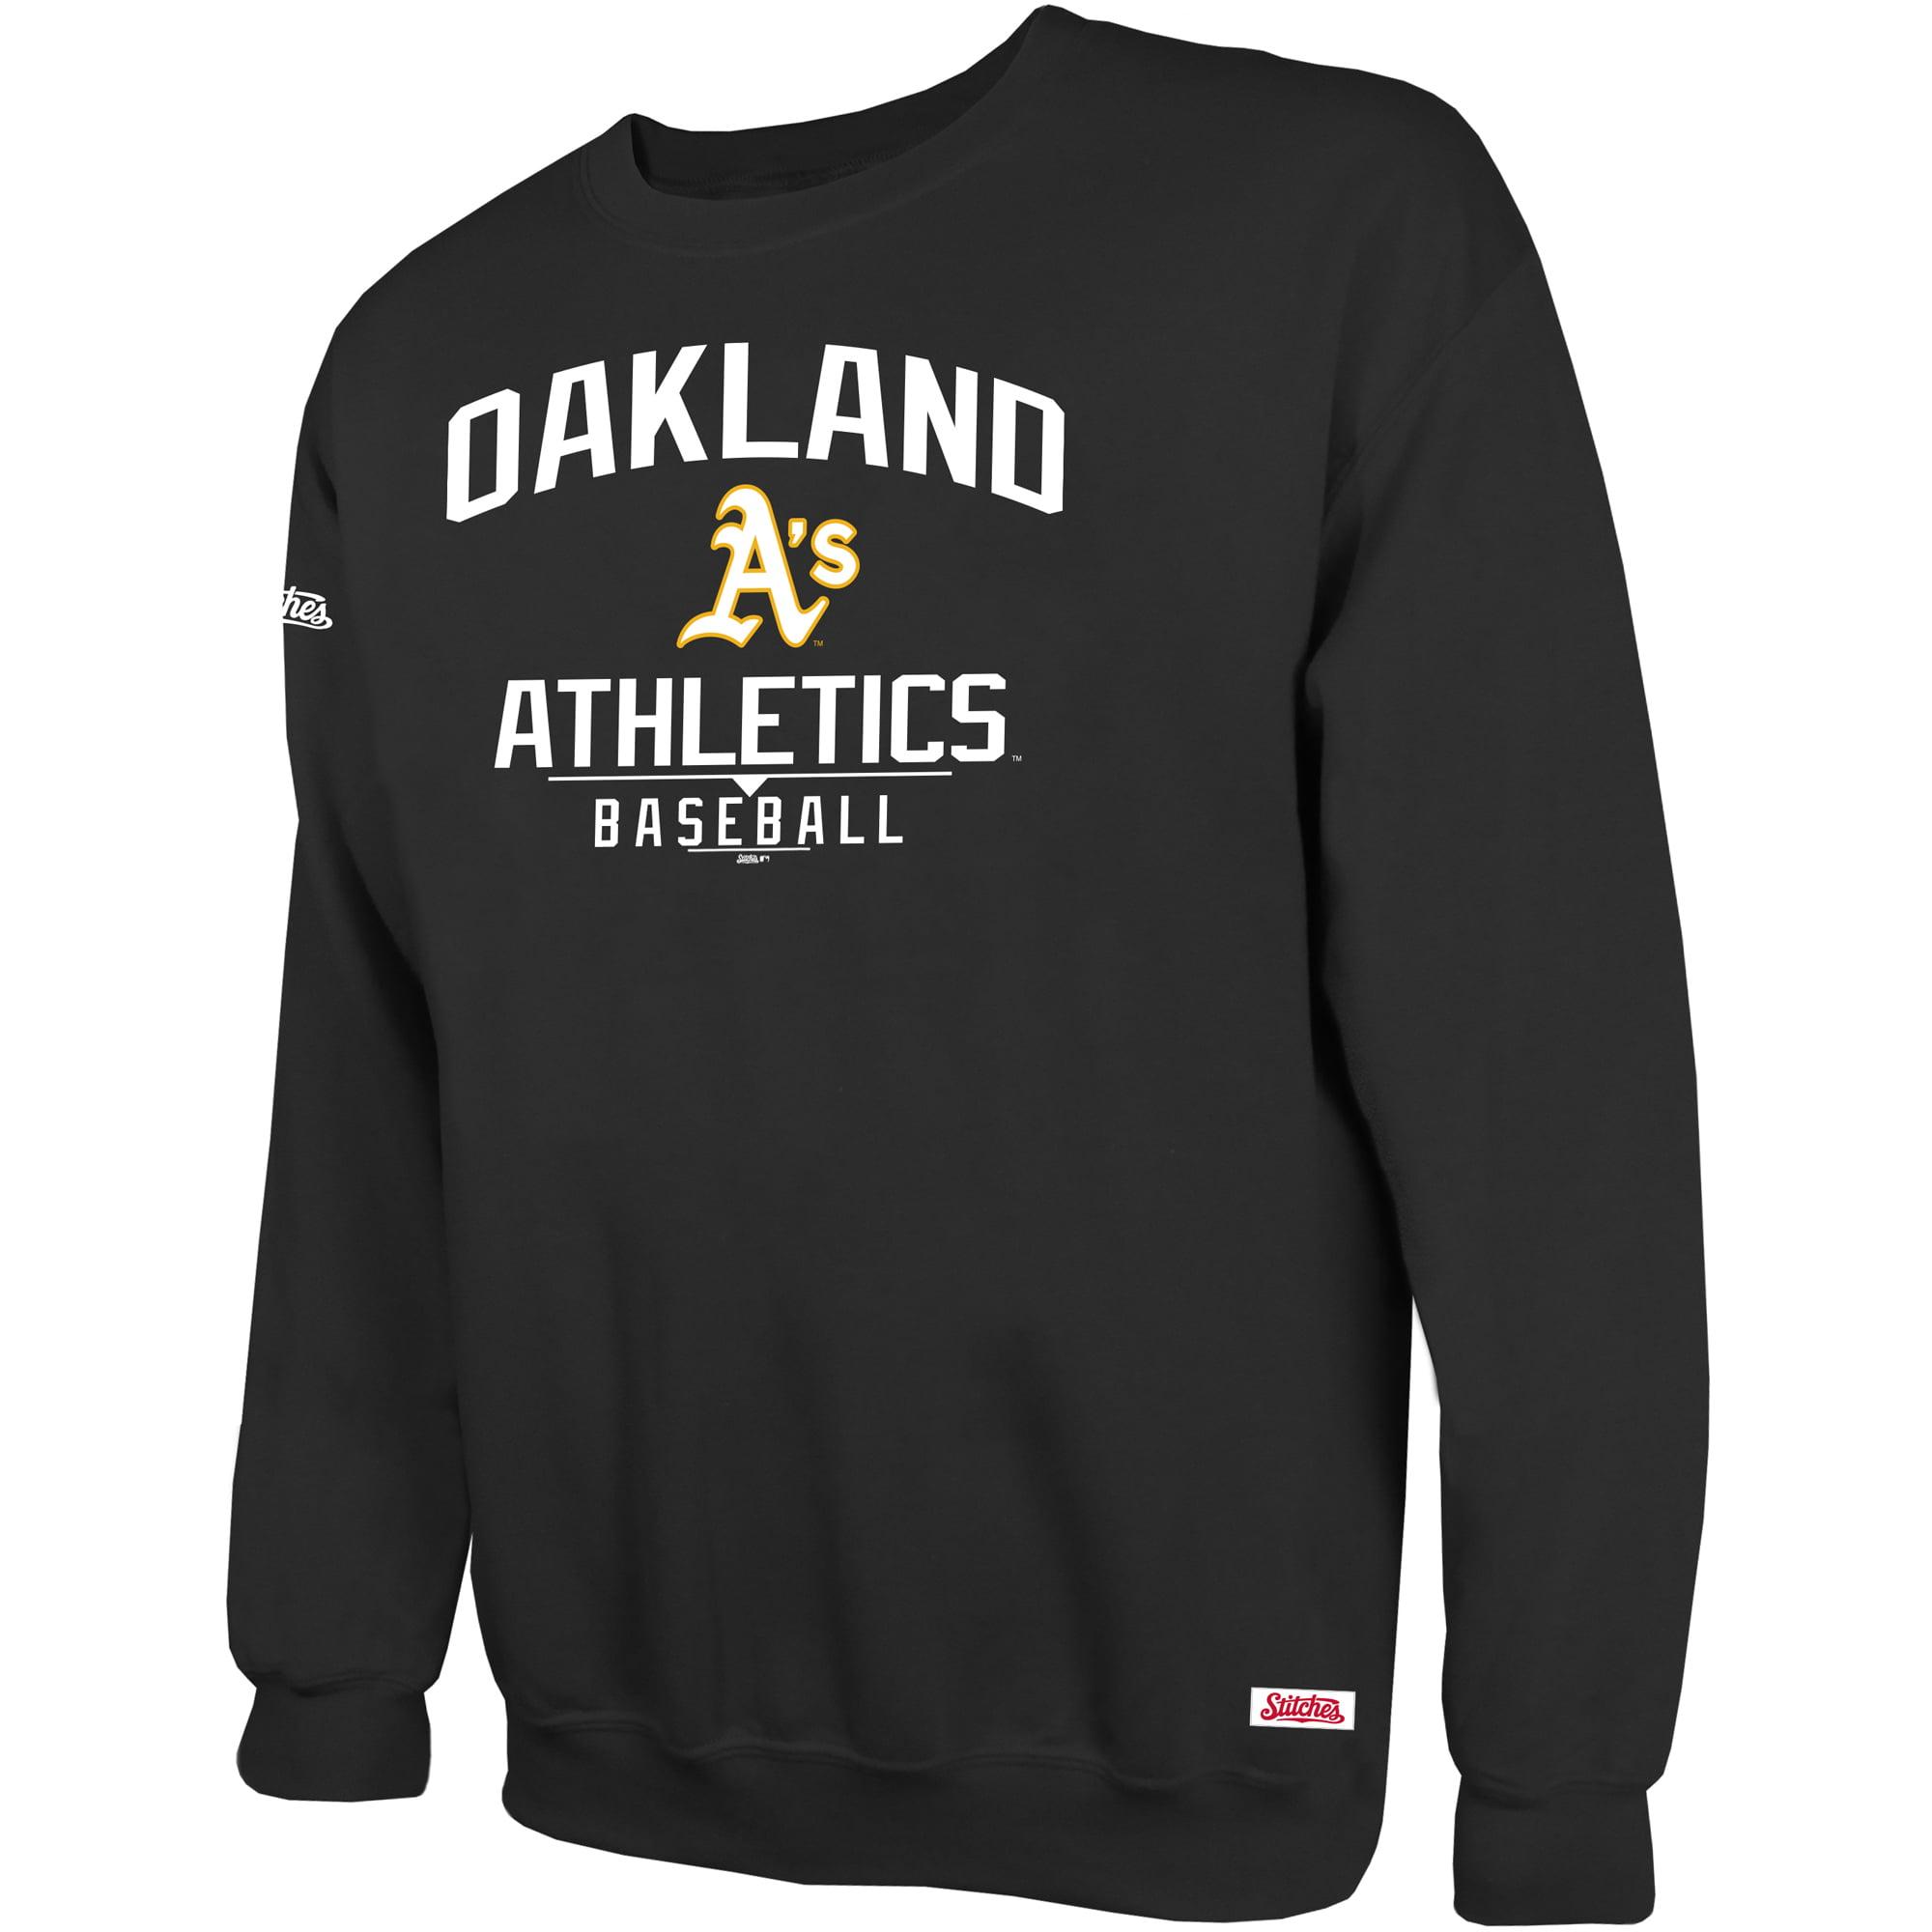 Oakland Athletics Stitches Holiday Pullover Crew Sweatshirt - Black